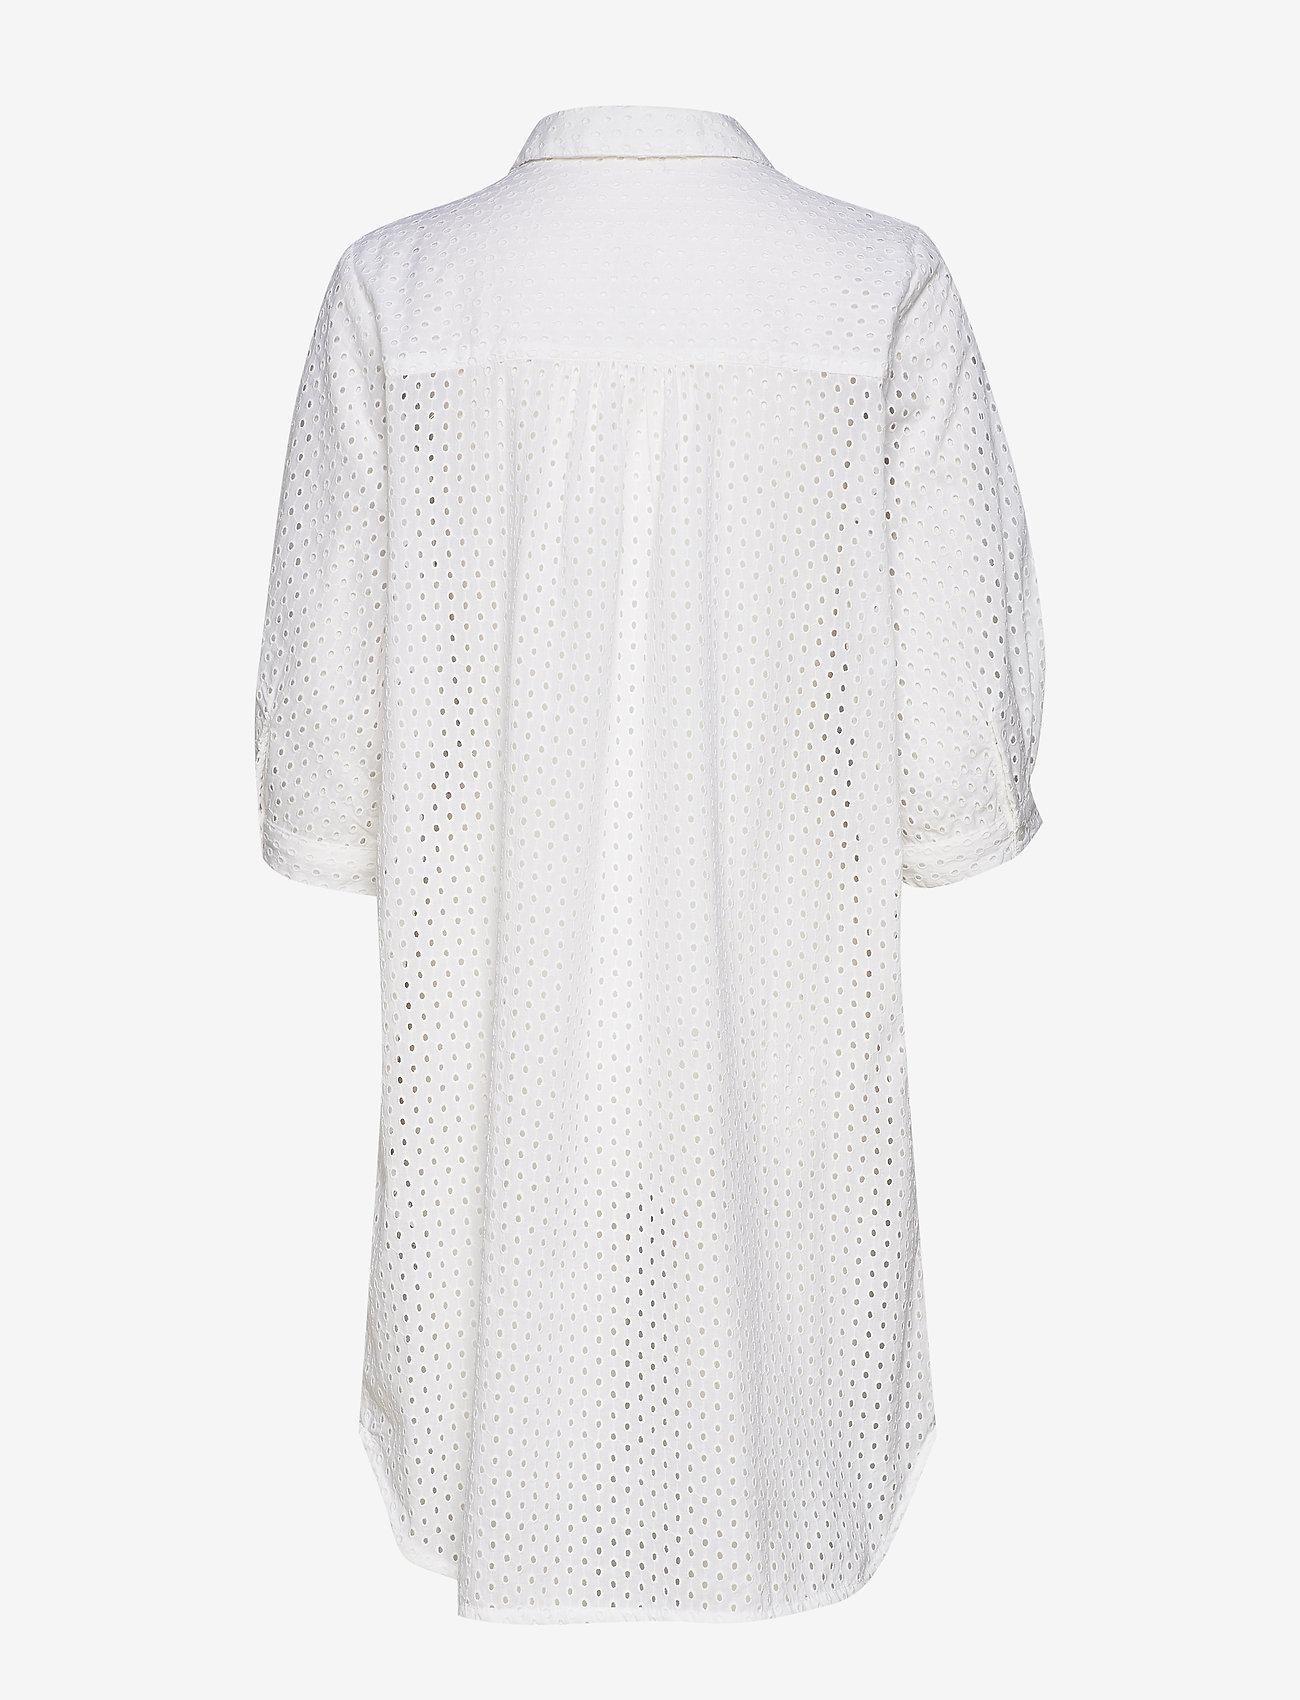 Rivaspw Tu (Bright White) (84.50 €) - Part Two Wi5Bc